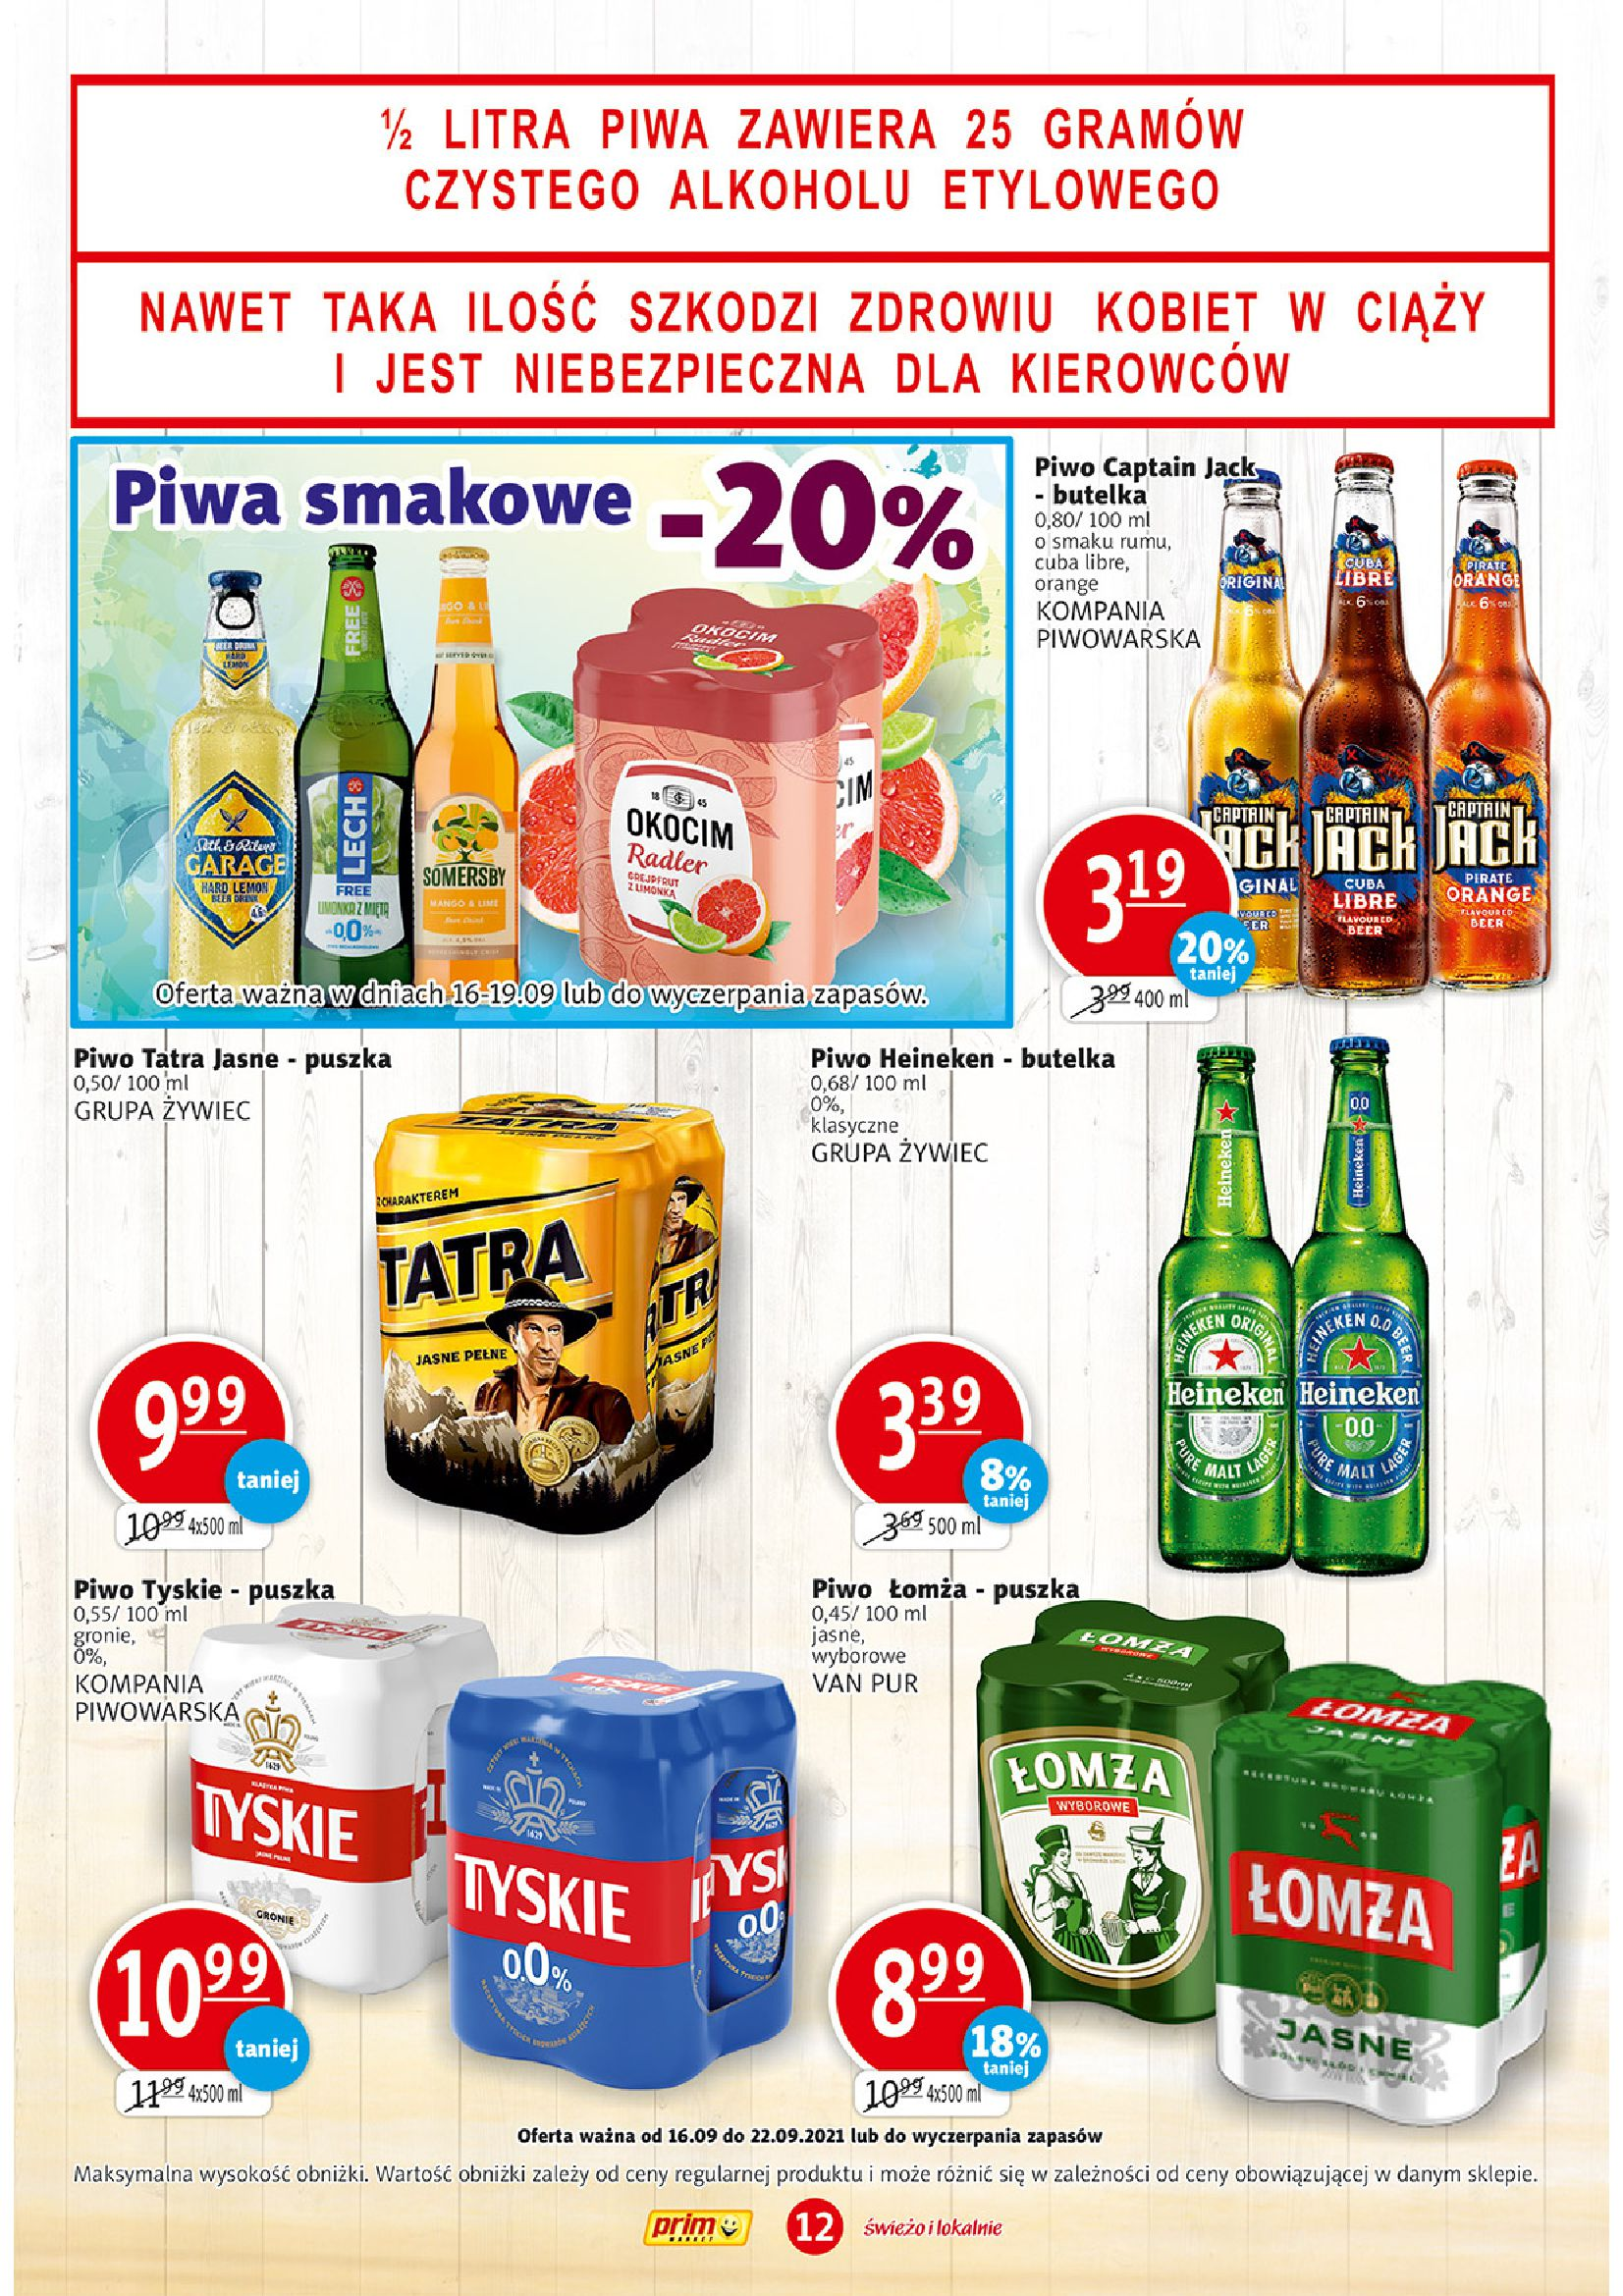 Gazetka PRIM MARKET: Gazetka PRIM MARKET - 16-22.09. 2021-09-16 page-12